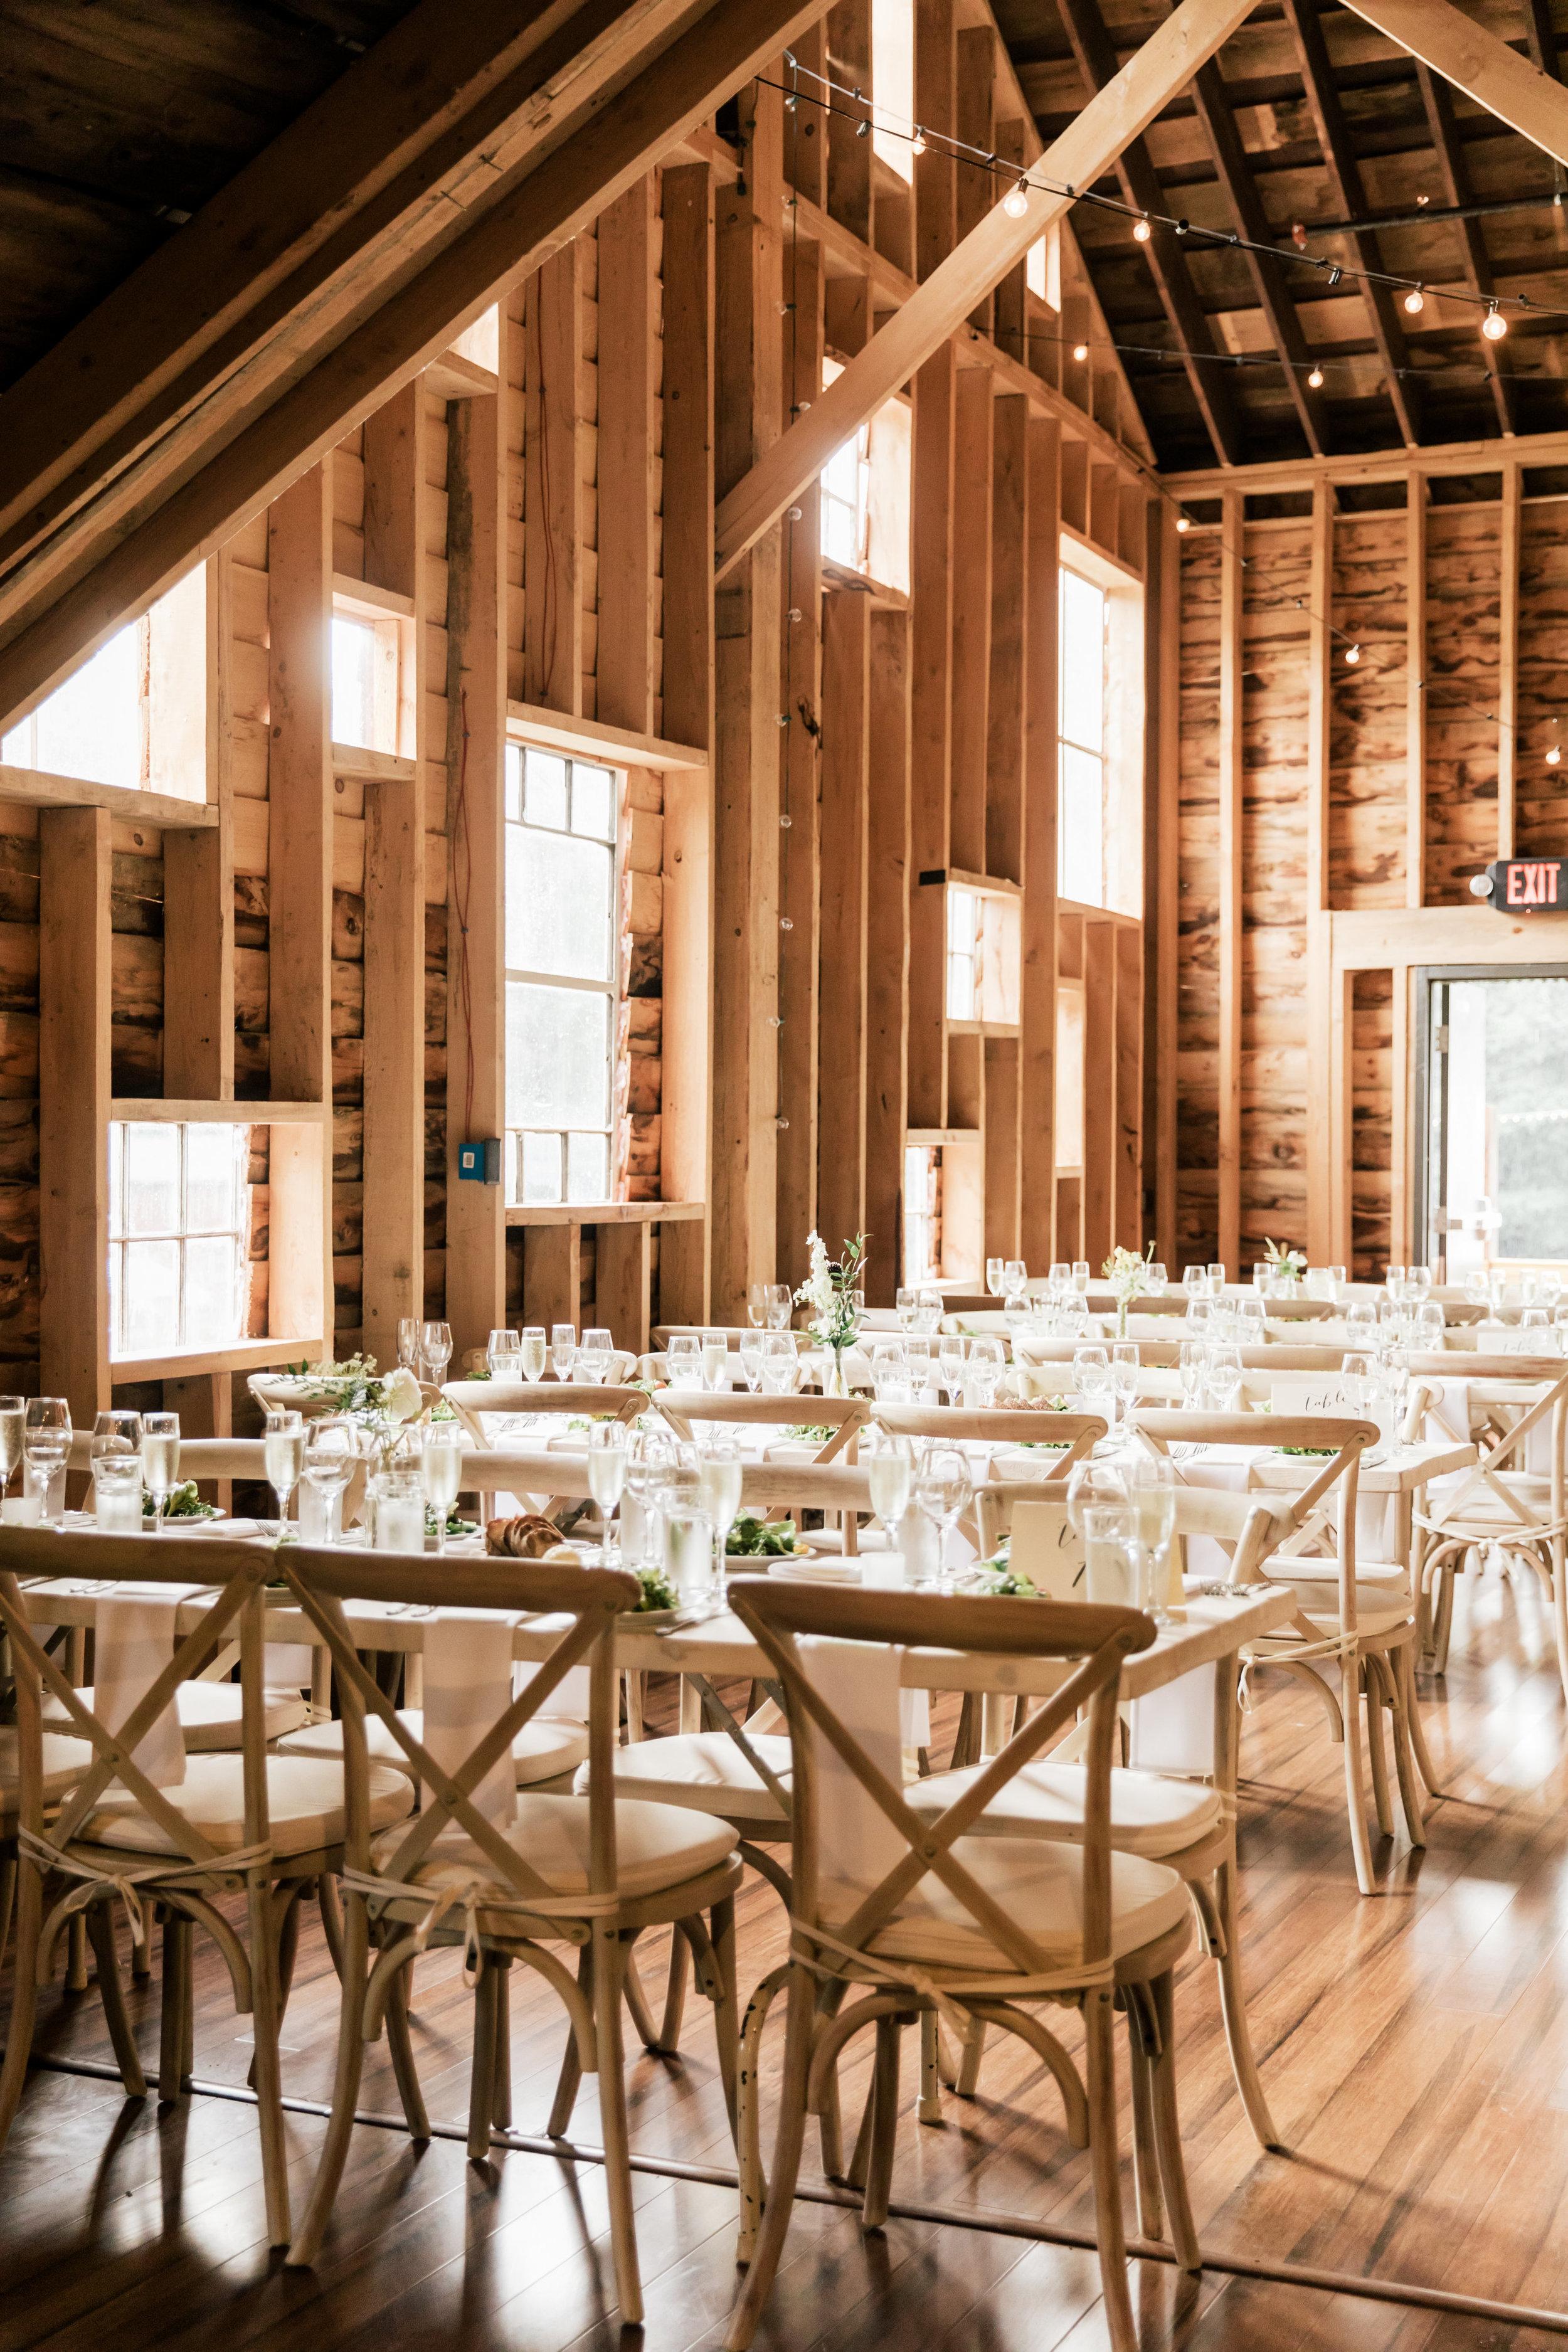 Ben Elise Wedding-Reception Details-0009.jpg